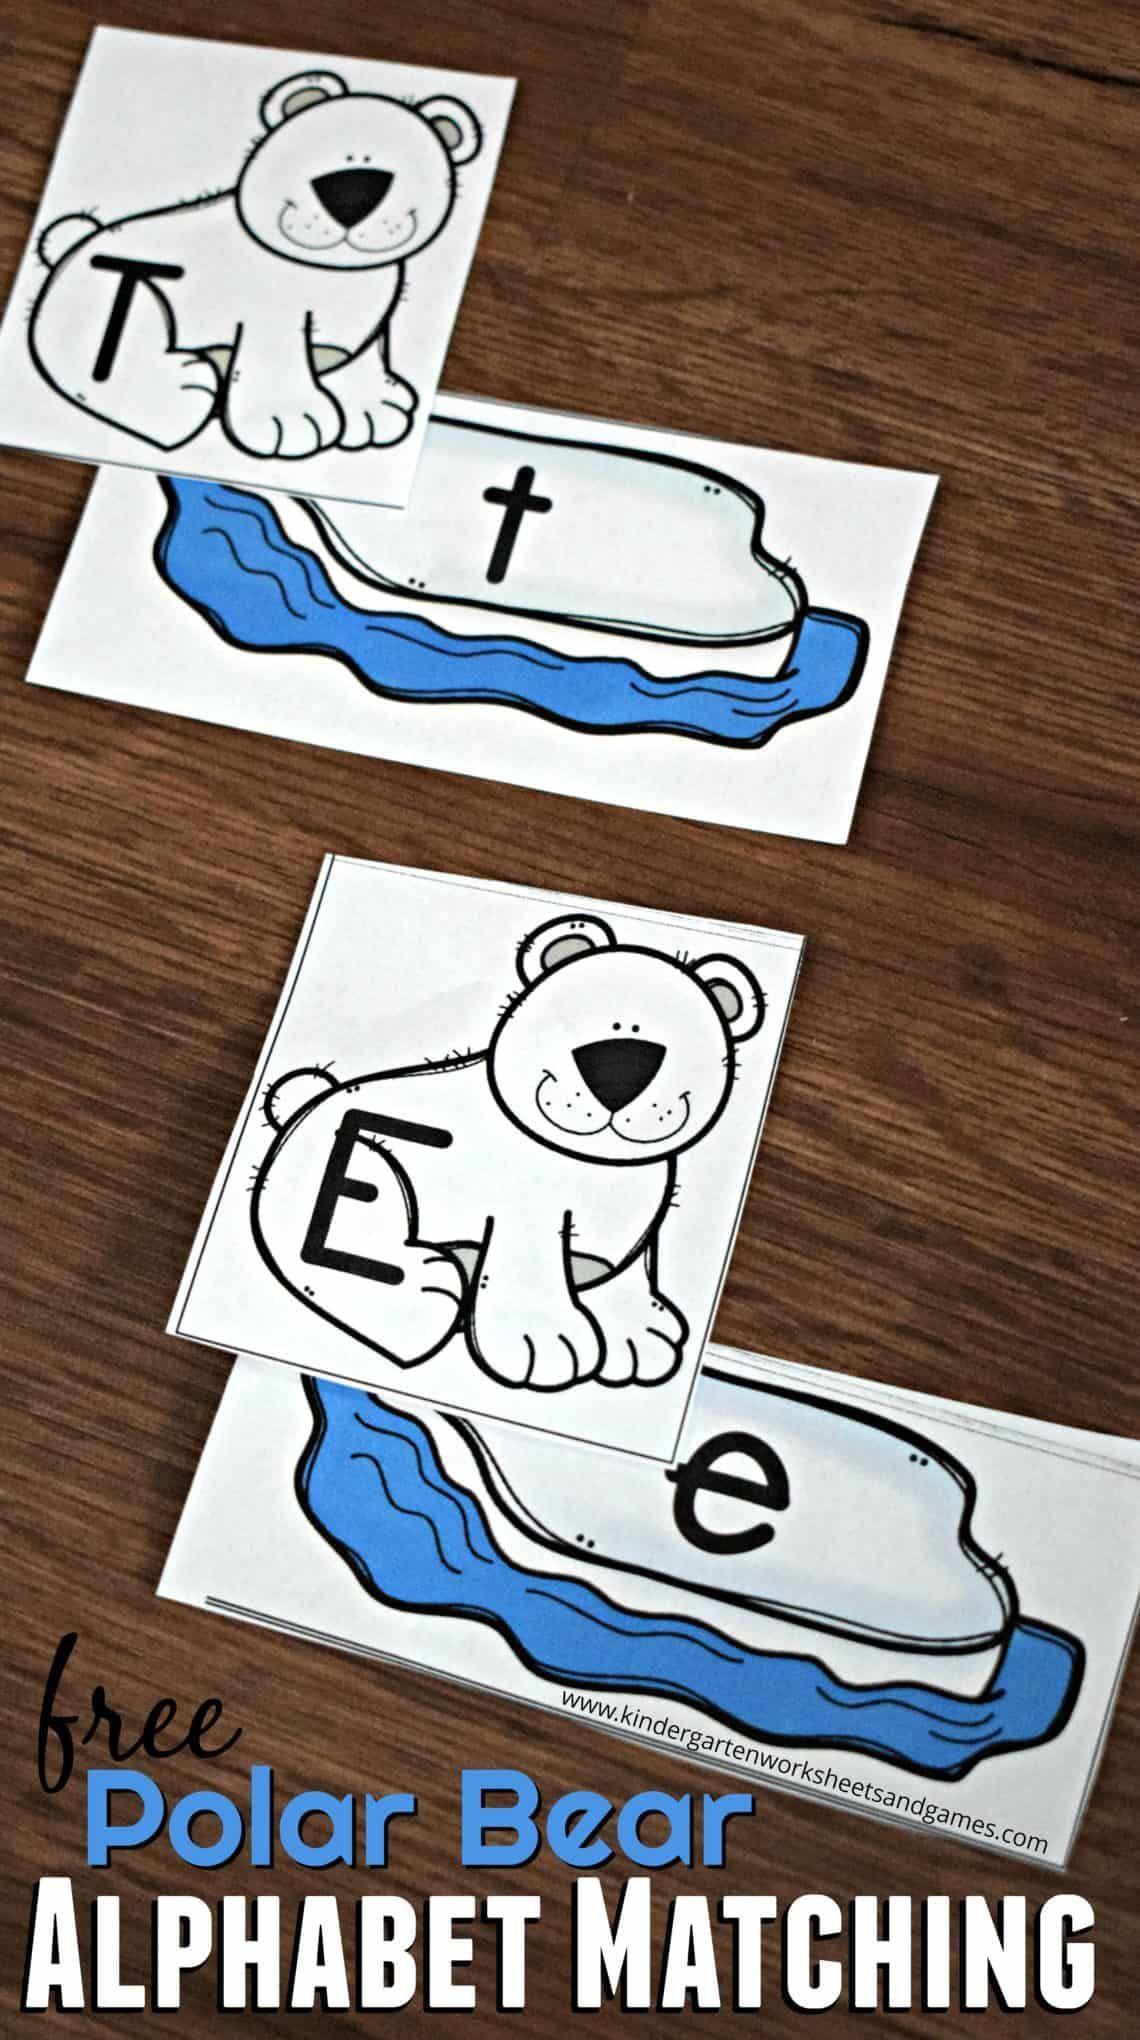 Polar Bear Alphabet Matching